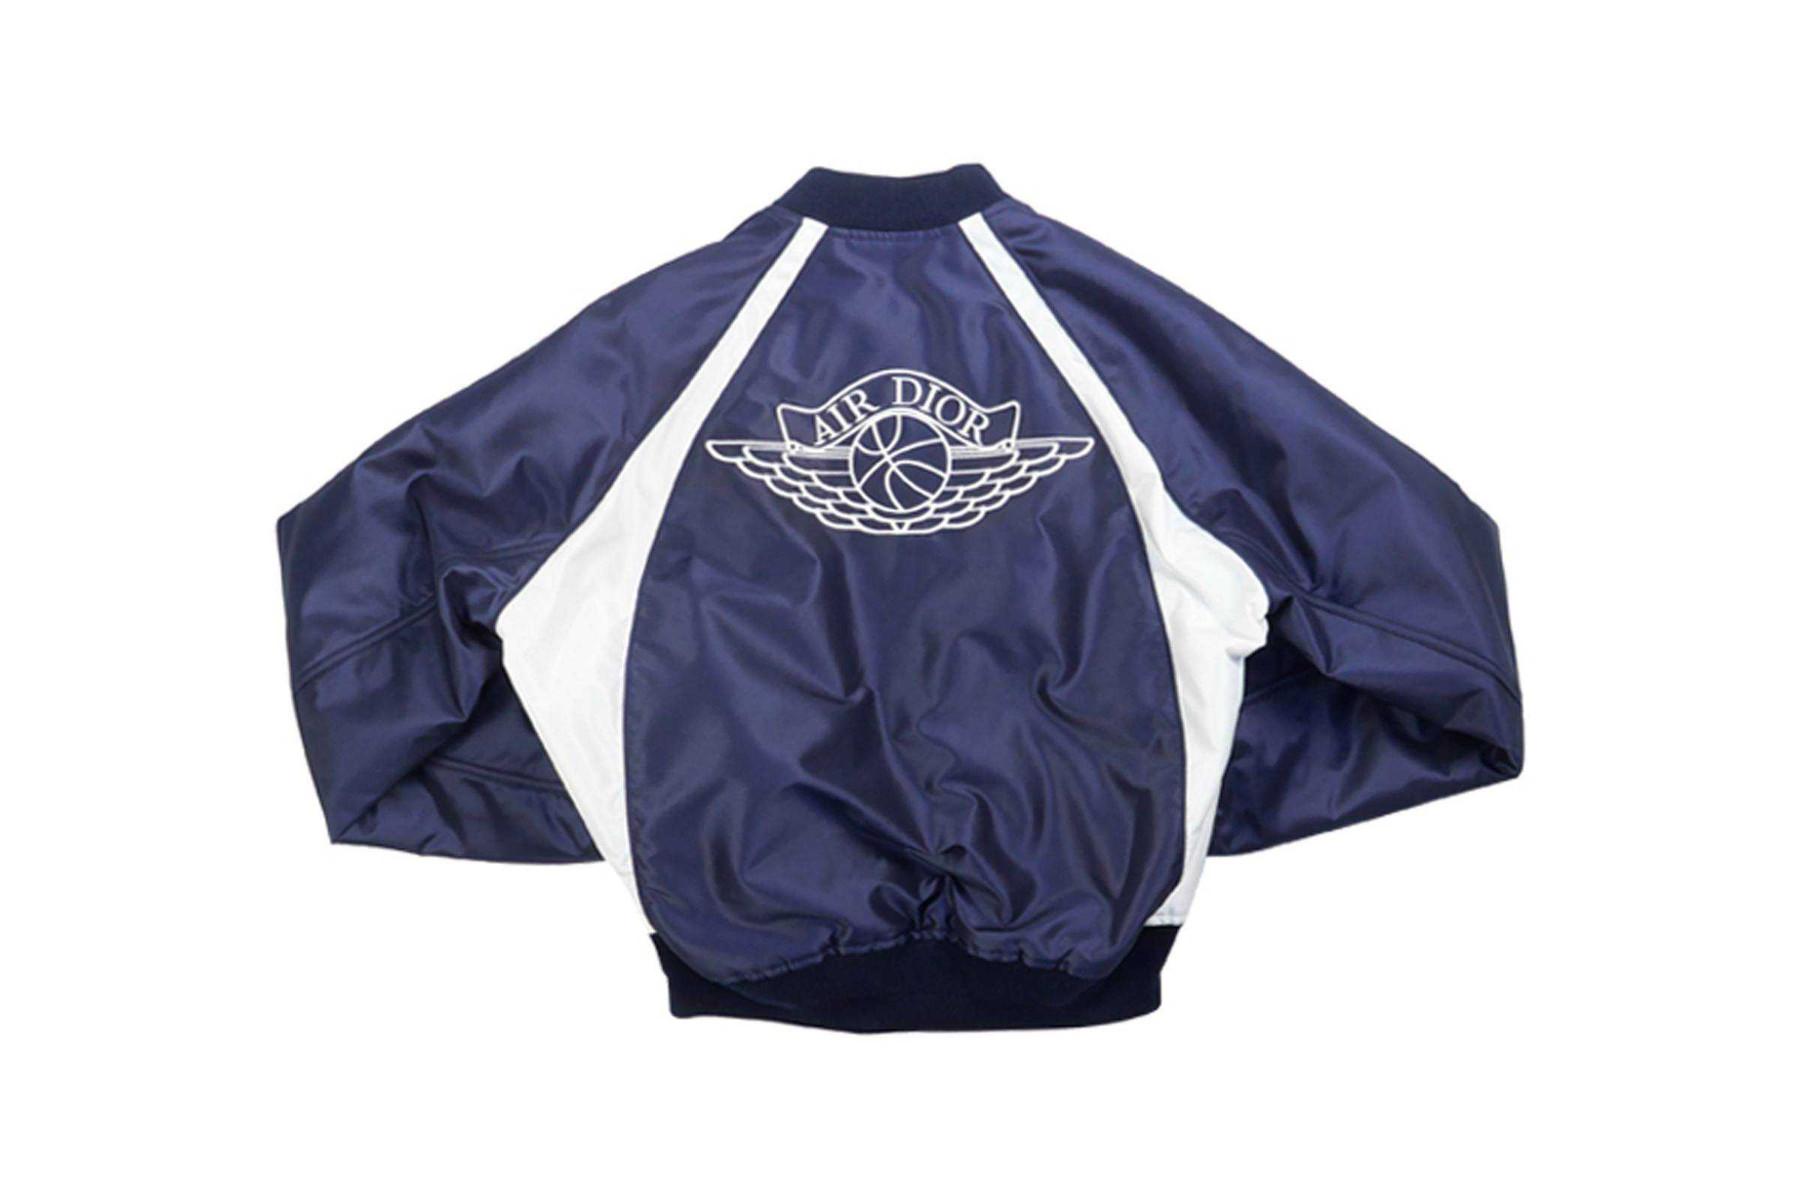 Dior x Jordan Brand Air Dior Bomber Jacket con wings logo